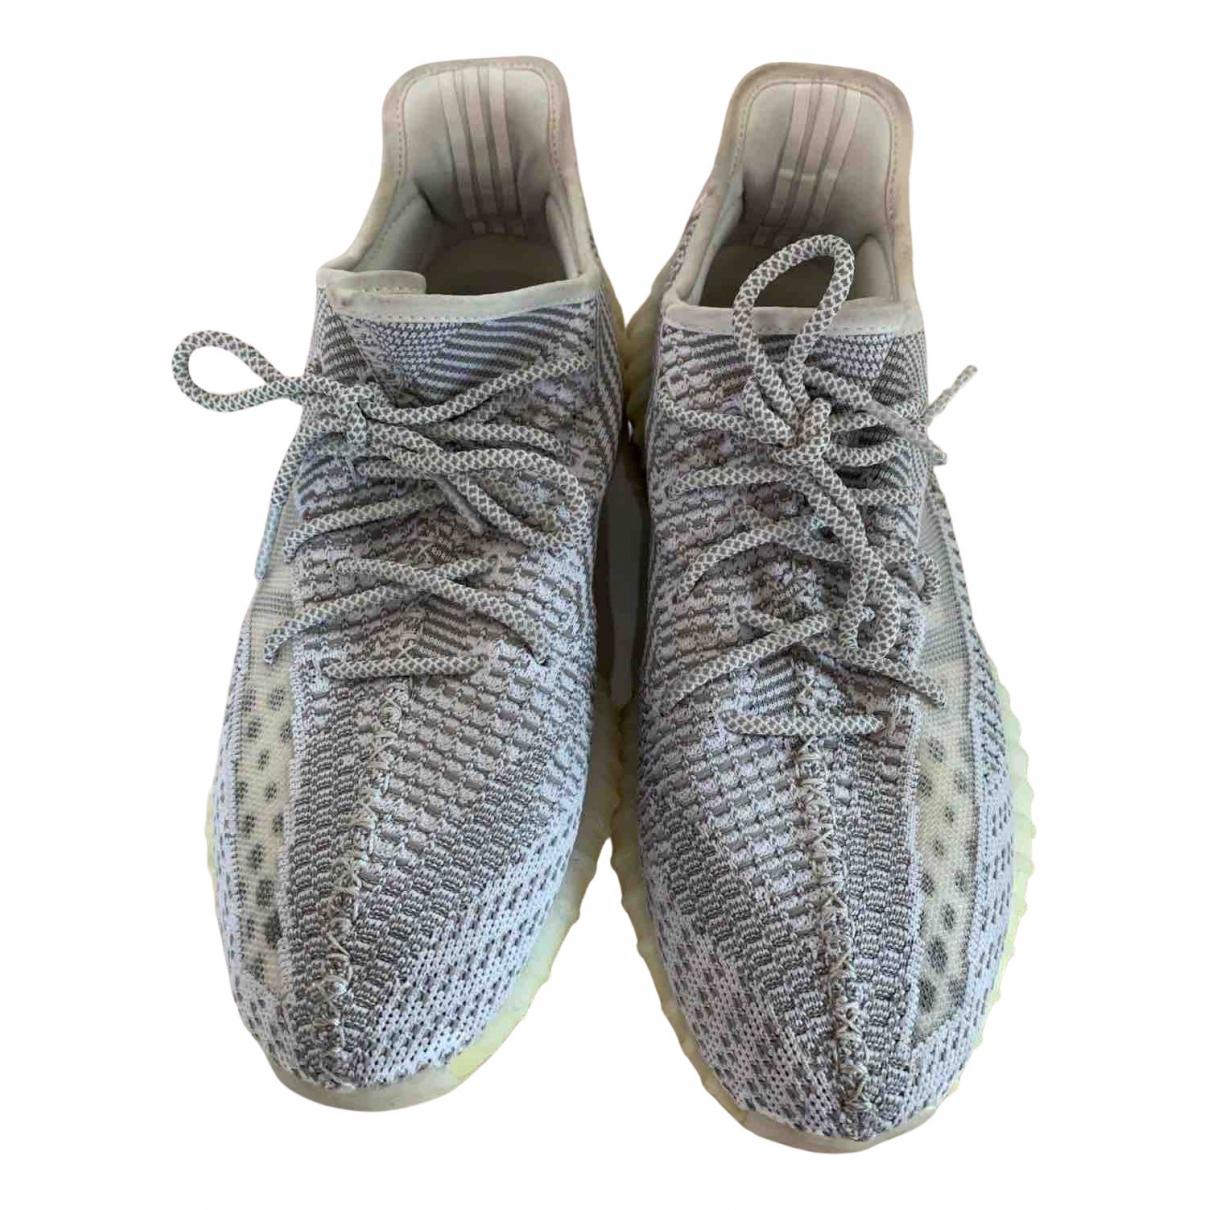 Yeezy X Adidas Boost 350 V2 Sneakers Bunt